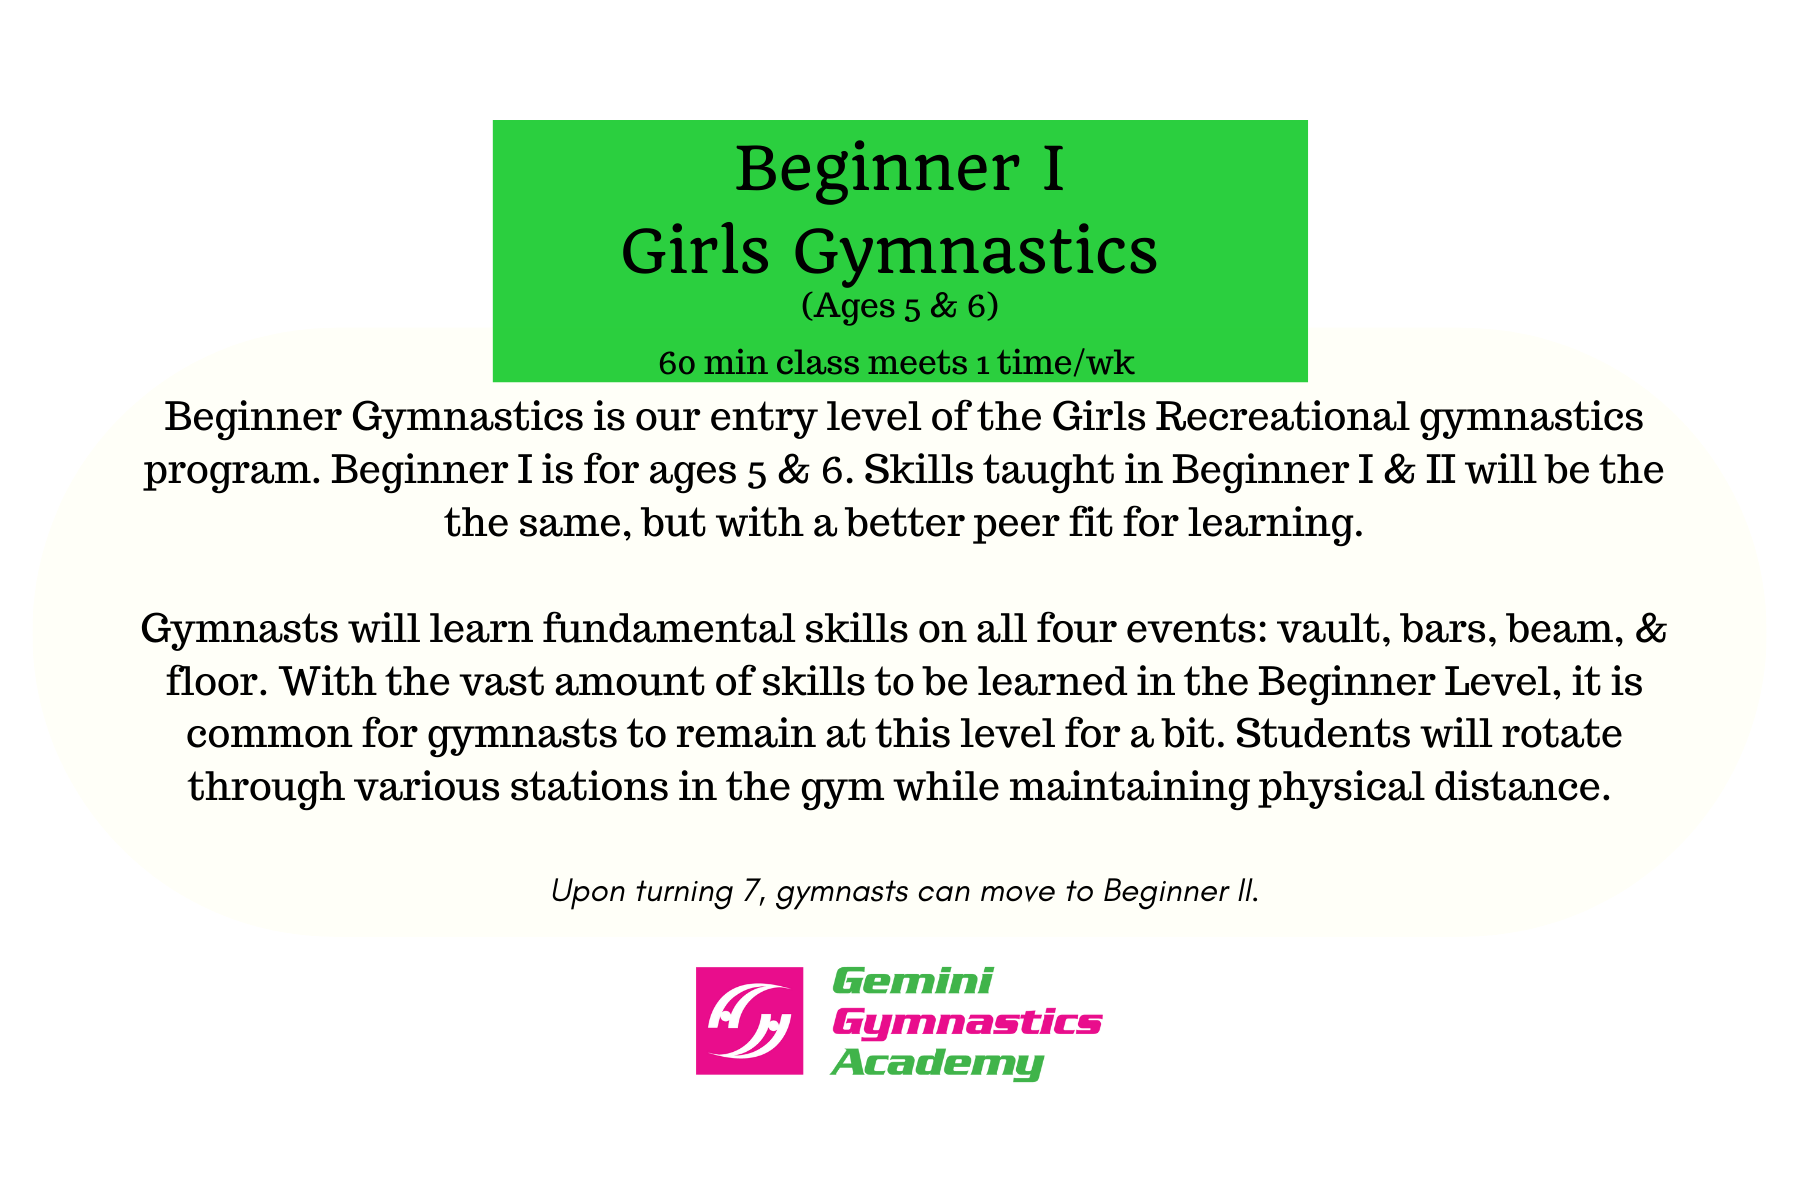 Beg gymnastics I